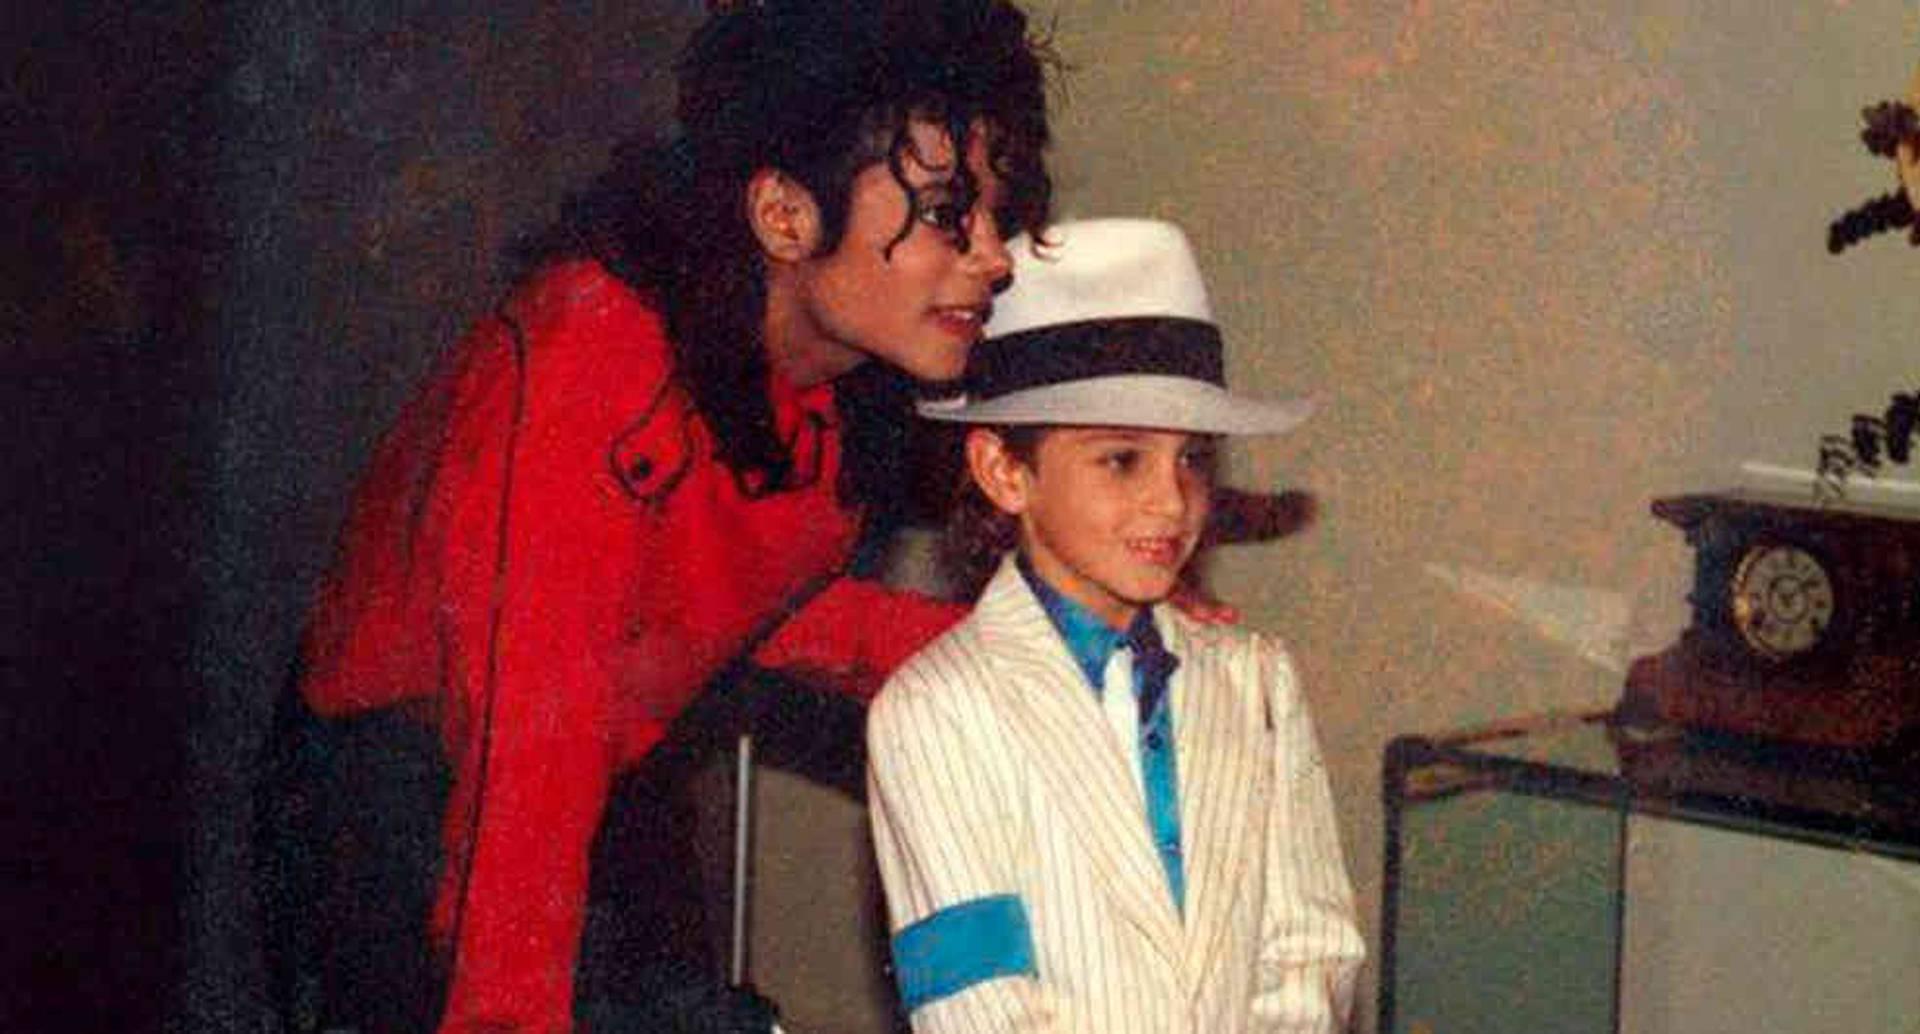 Michael Jackson en 'Leaving Neverland', el polémico documental de HBO.